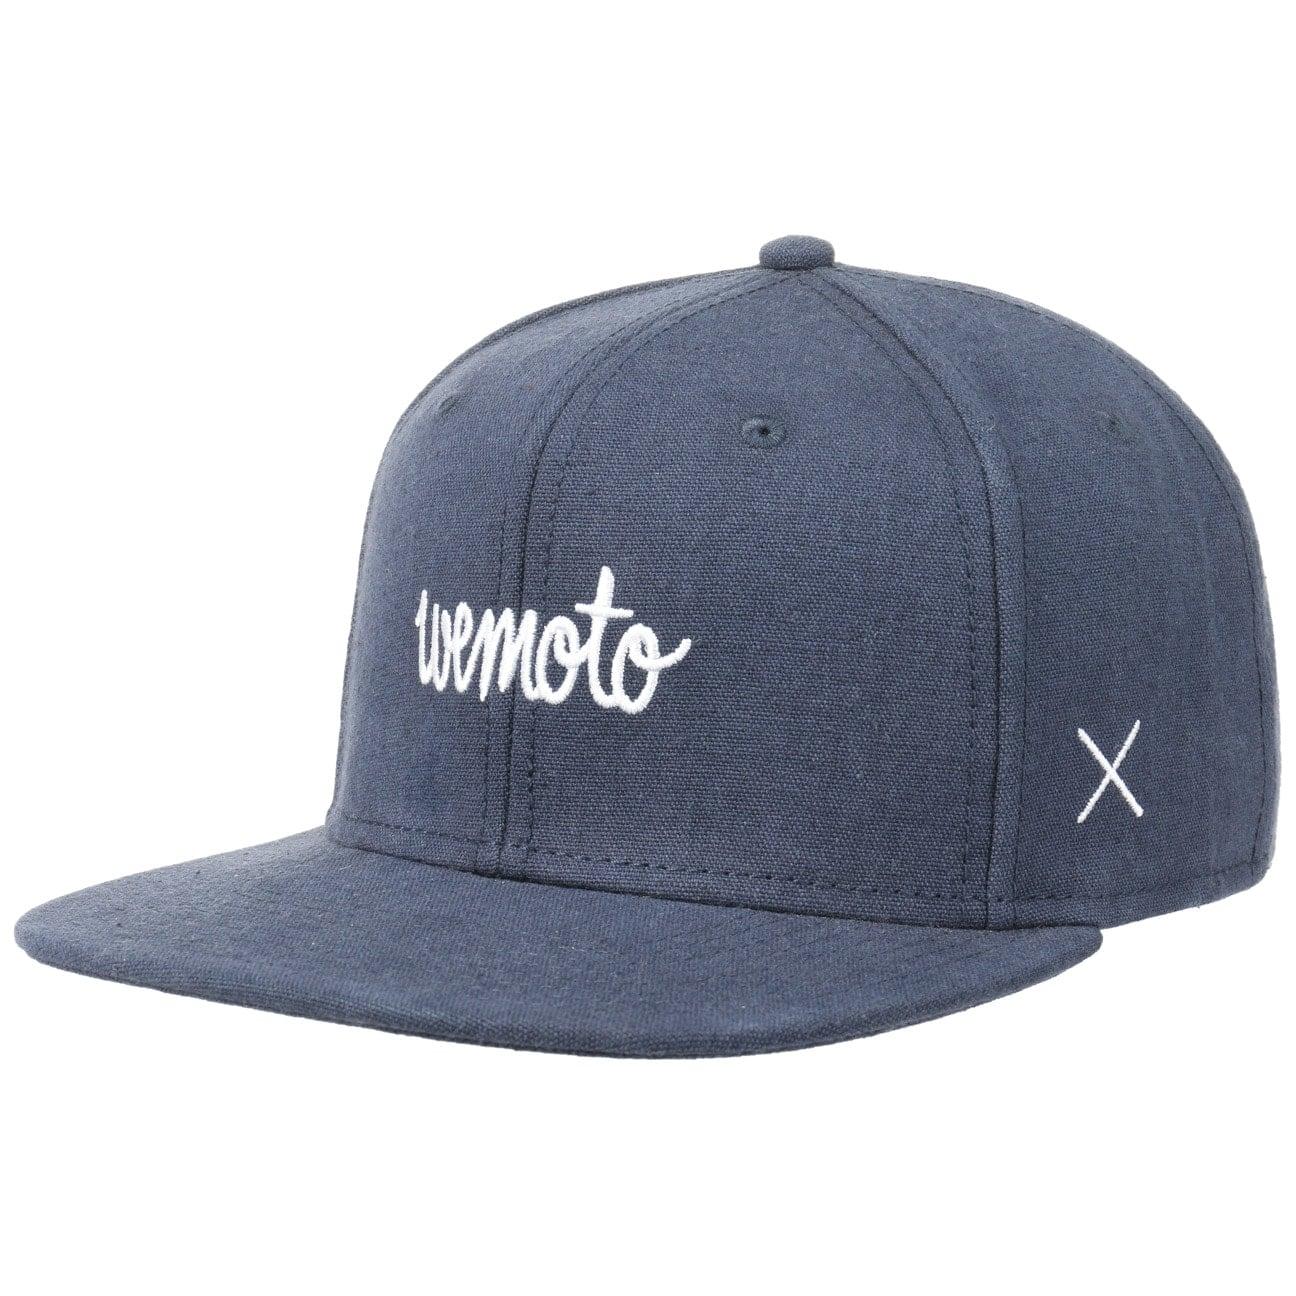 Casquette Script Snapback by Wemoto  baseball cap